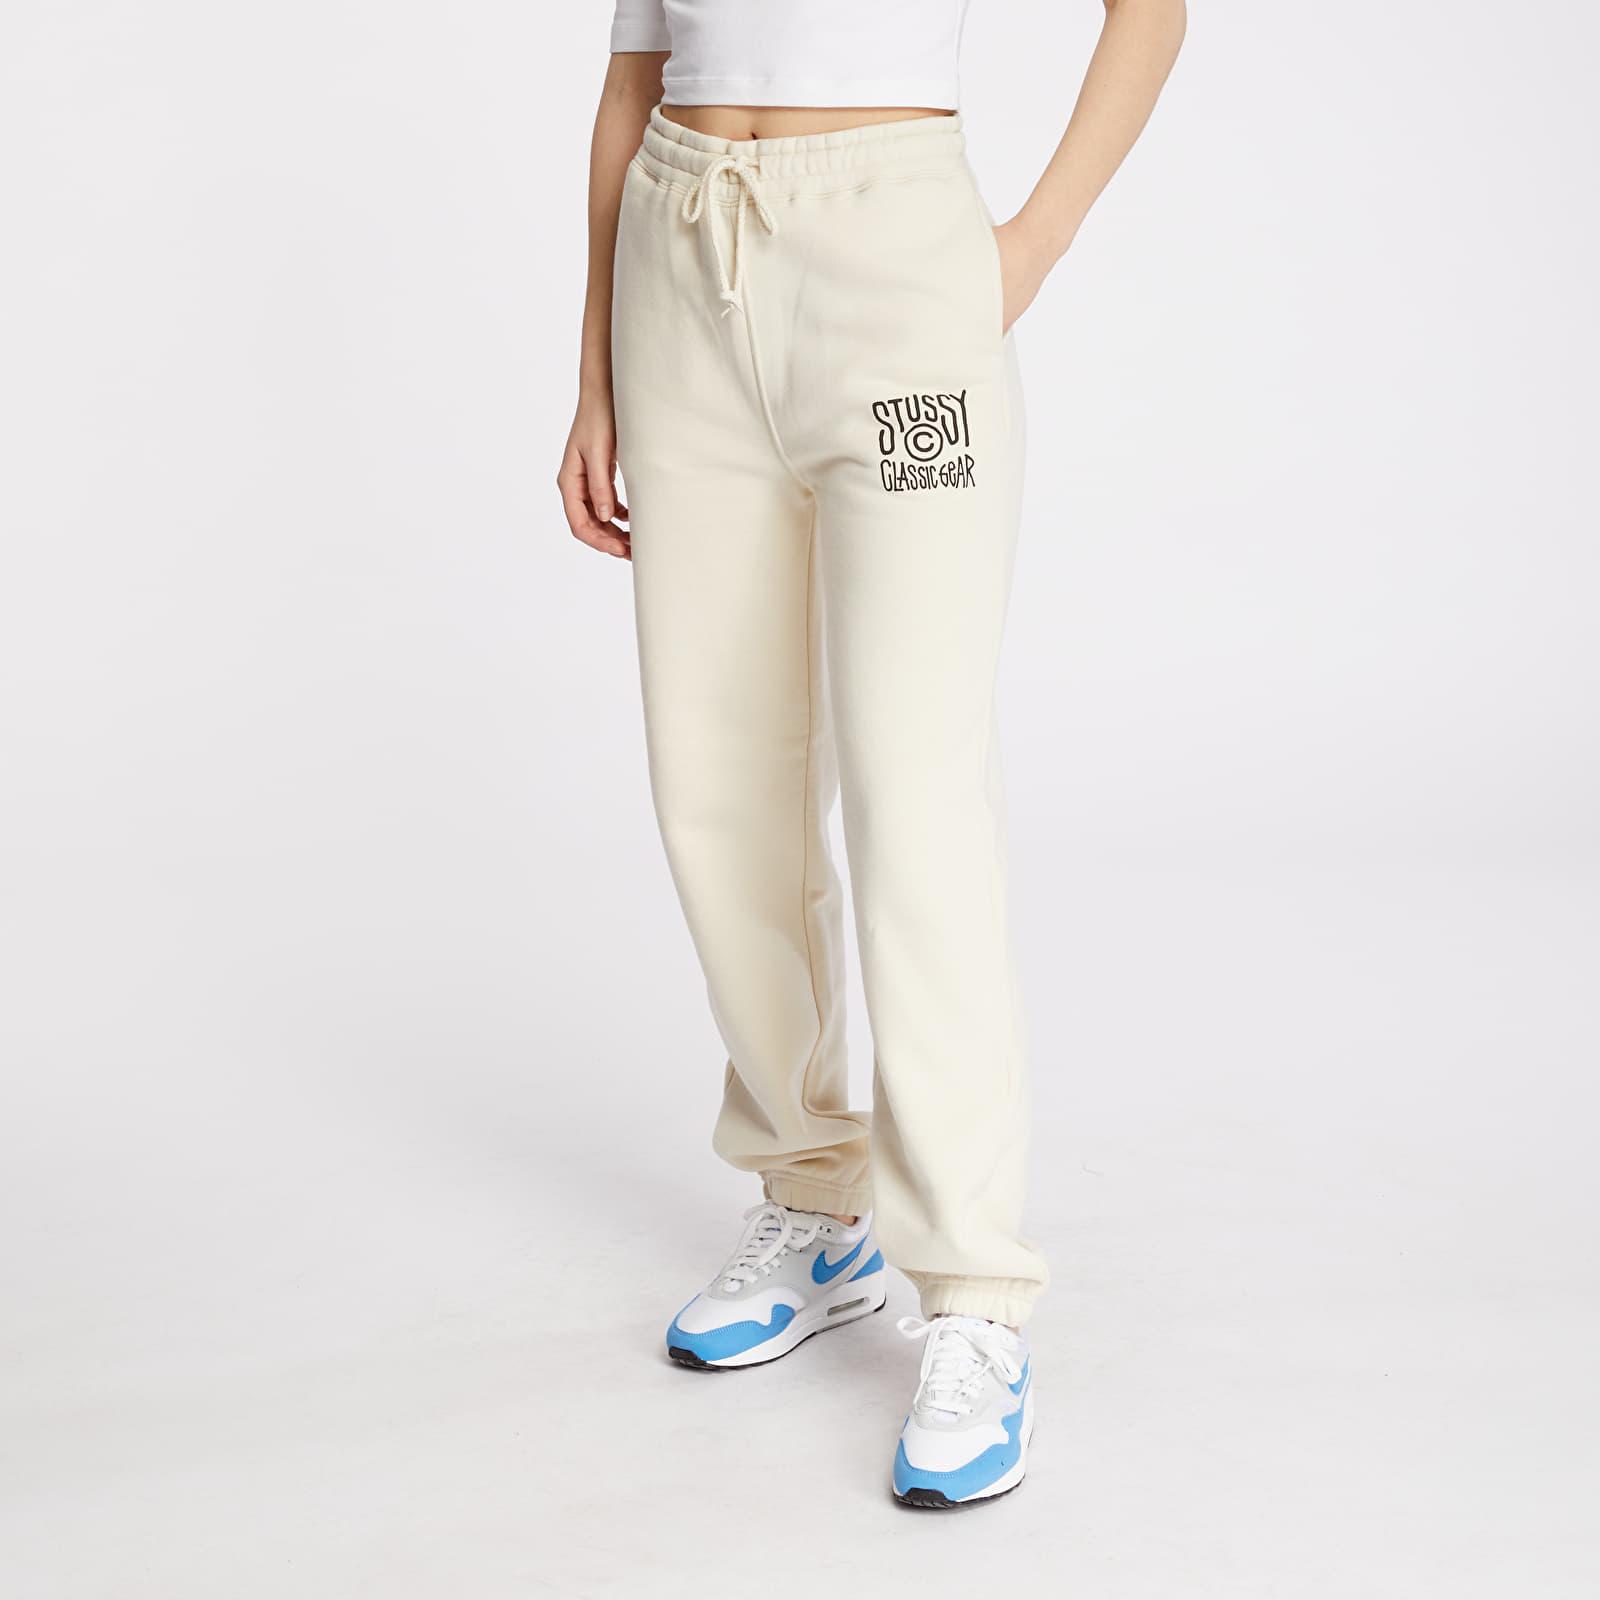 Clothing Stüssy Classic Gear Sweatpants Cement